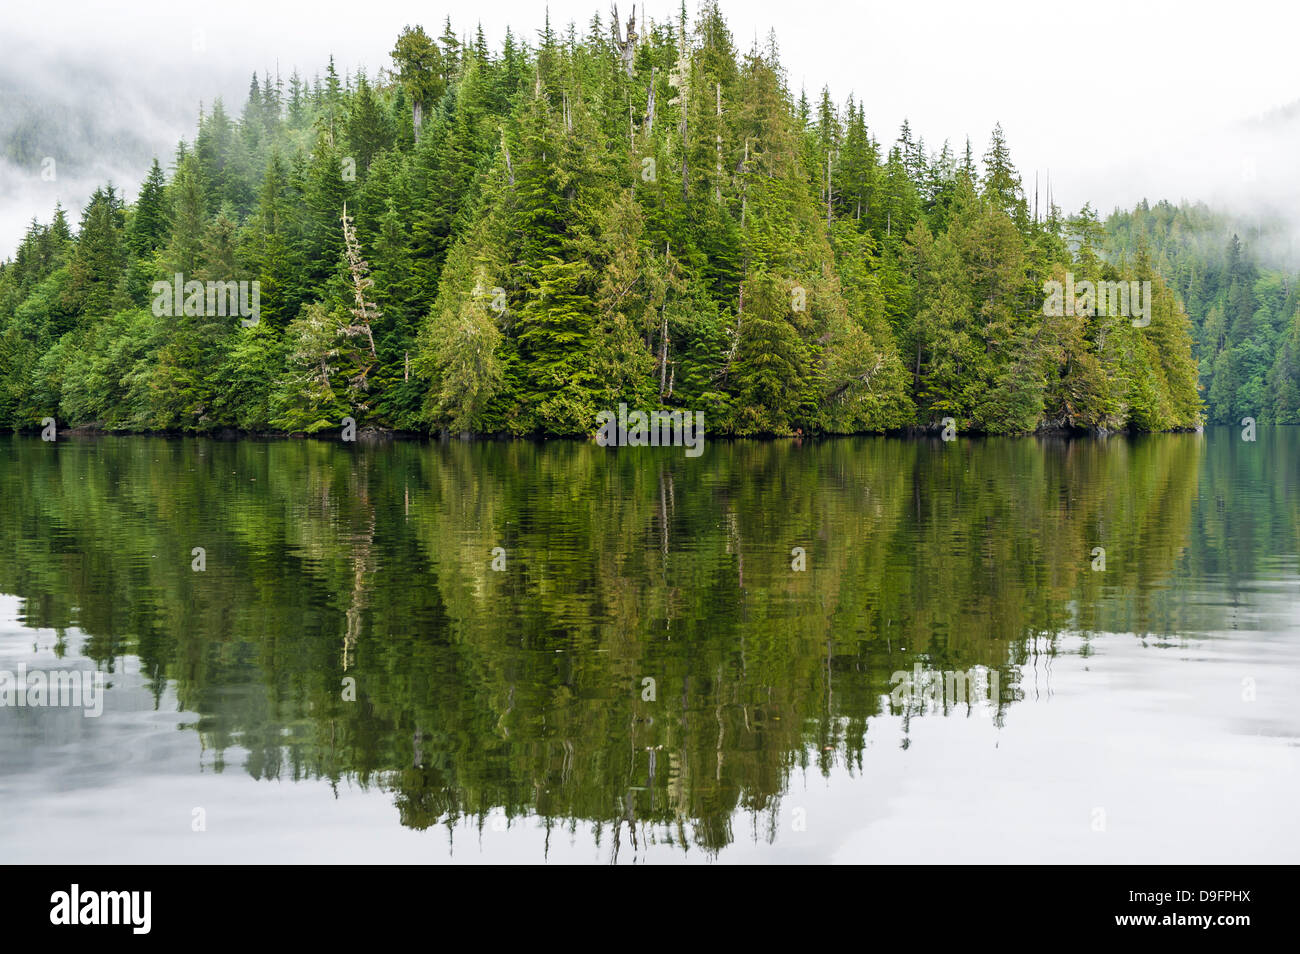 Küstenlandschaft in Great Bear Rainforest, British Columbia, Kanada Stockbild